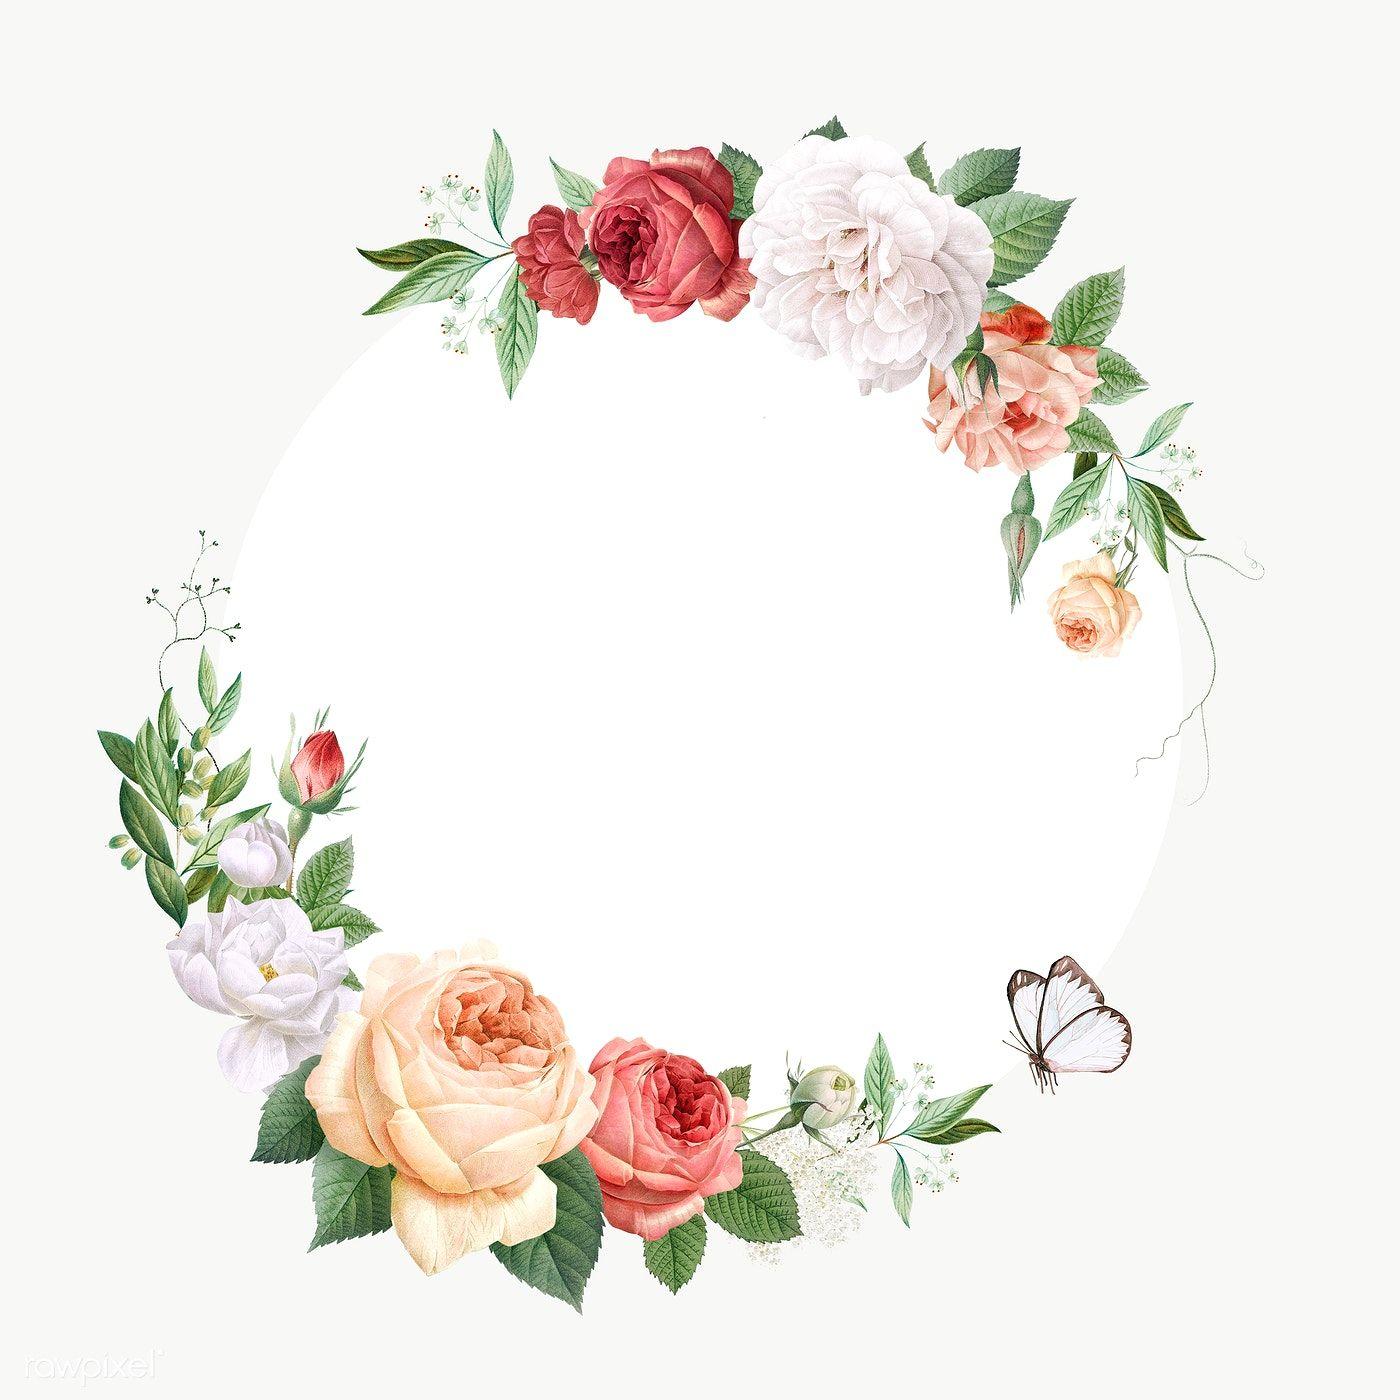 Floral Wedding Invitation Mockup Transparent Png Premium Image By Rawpixel Com Por Piangp Floral Border Design Floral Wedding Invitations Invitation Mockup